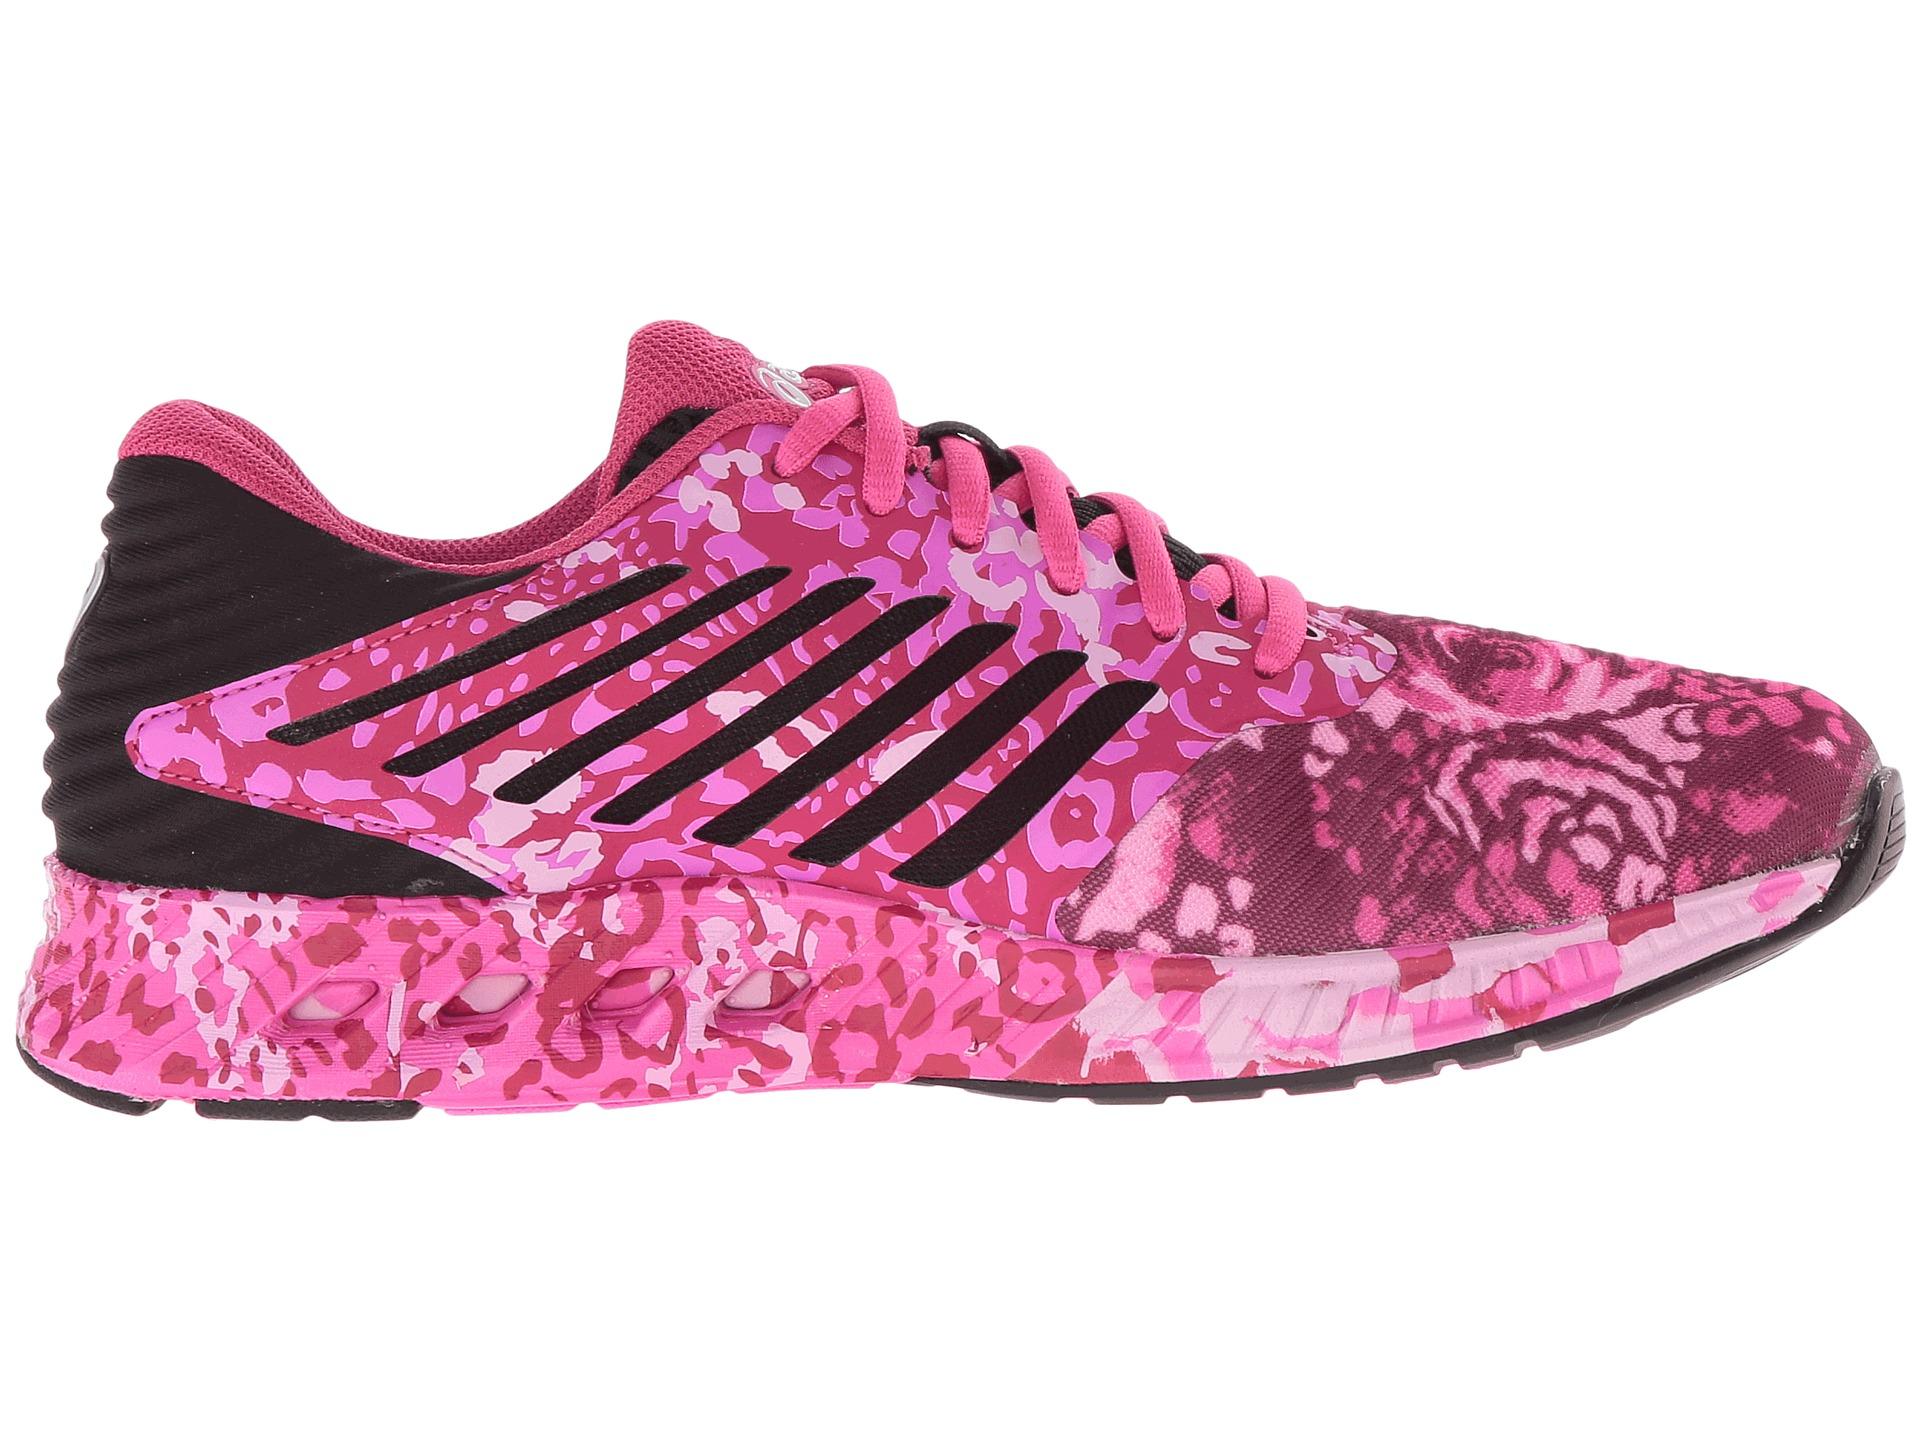 asics fuzex pr pink glow white pink ribbon zappos